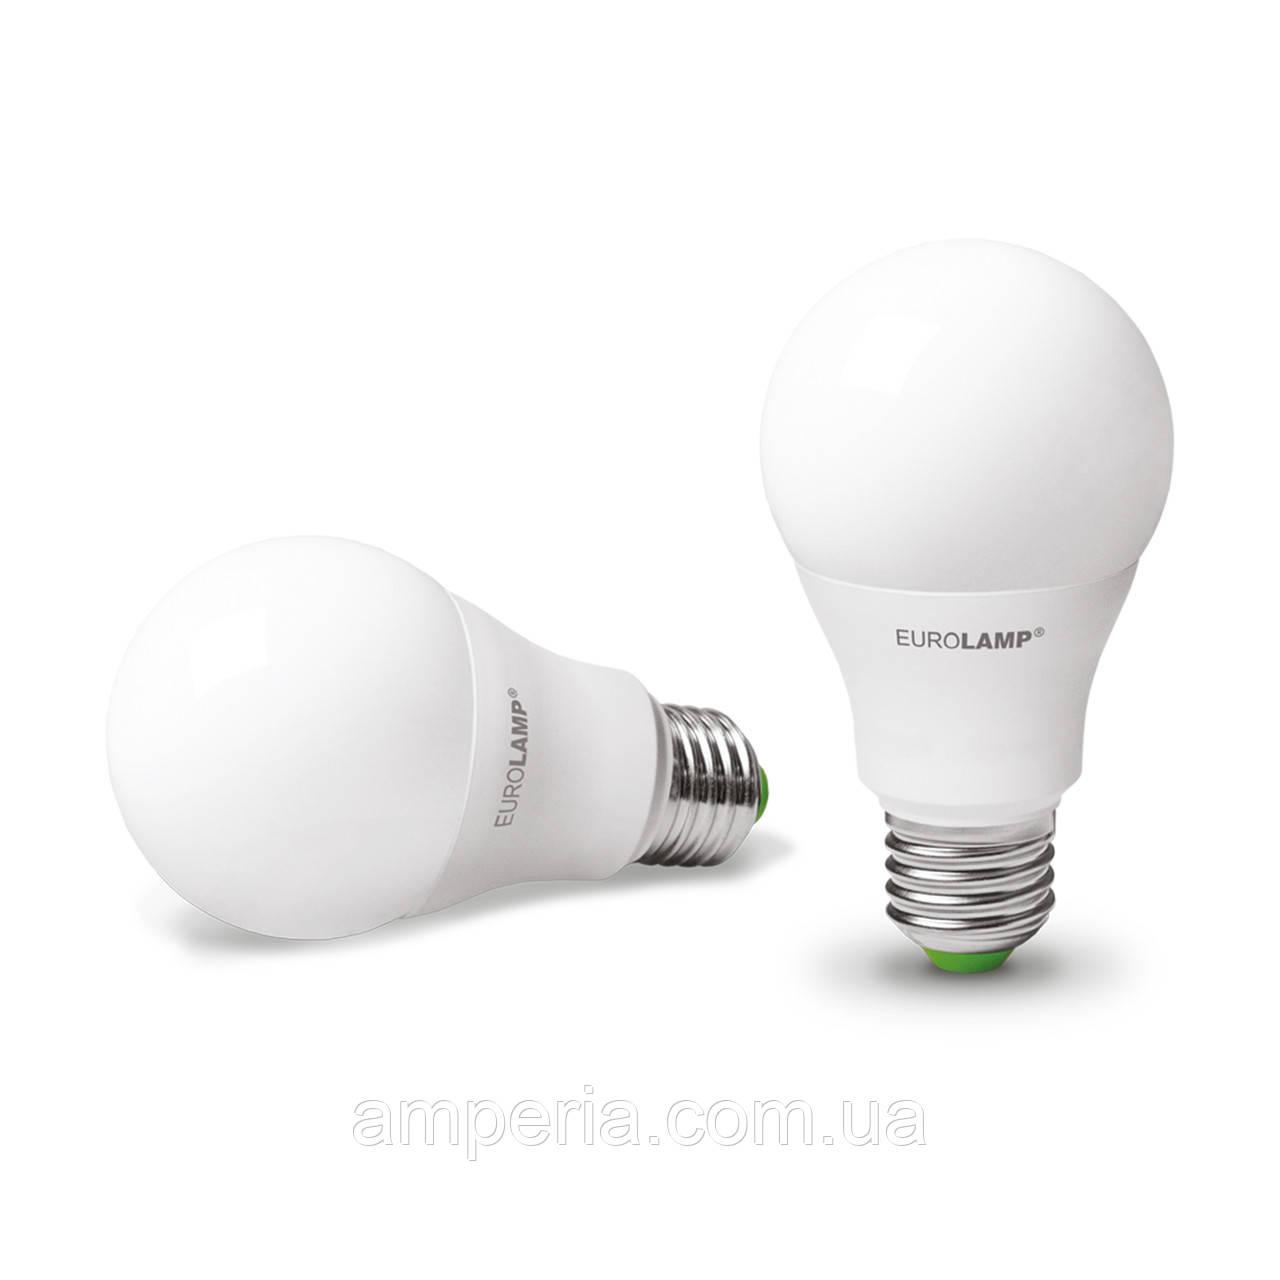 EUROLAMP LED Лампа ЕКО A60 10W E27 4000K (LED-A60-10273(D))